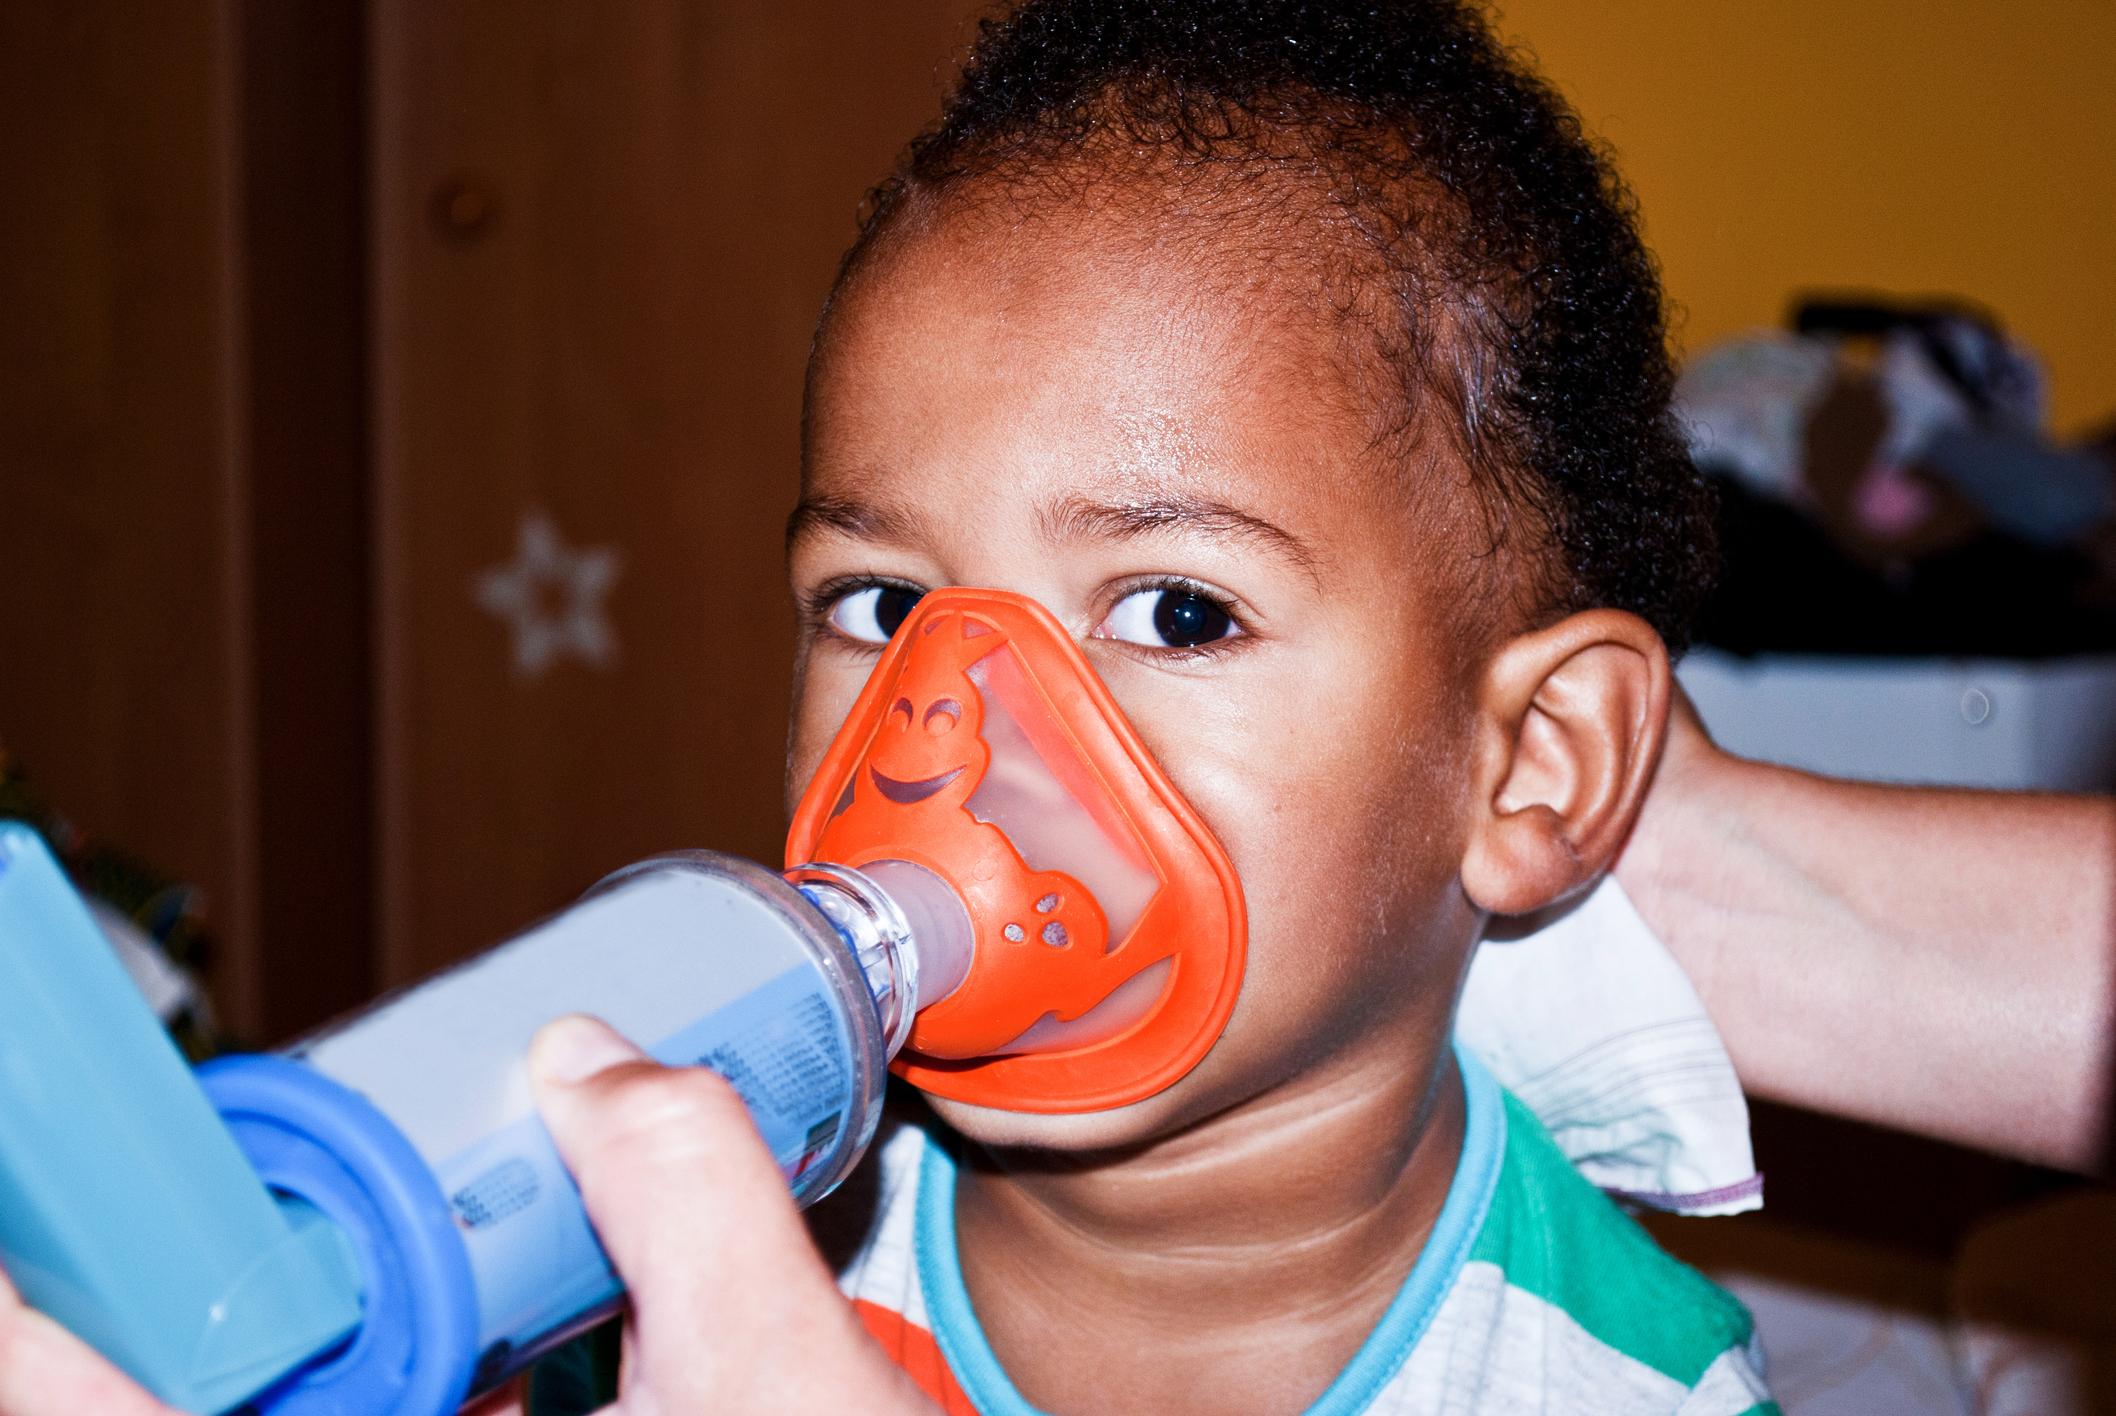 Omega-3 Fatty Acids Tied to Fewer Childhood Asthma Symptoms